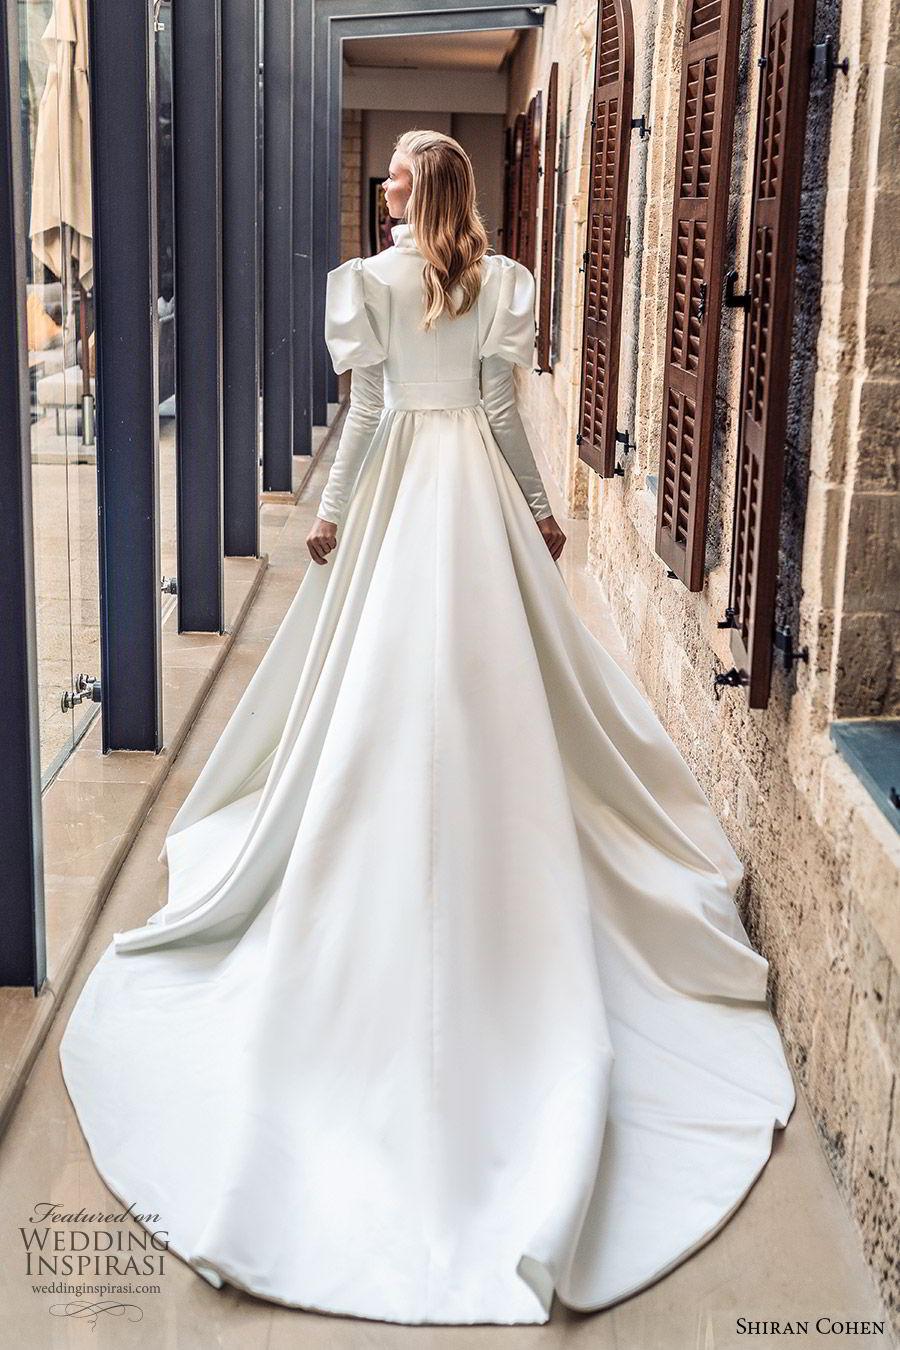 shiran cohen 2019 bridal mutton sleeves plunging v neckline collar belt a line ball gown wedding dress chapel train romantic princess clean modern (5) bv